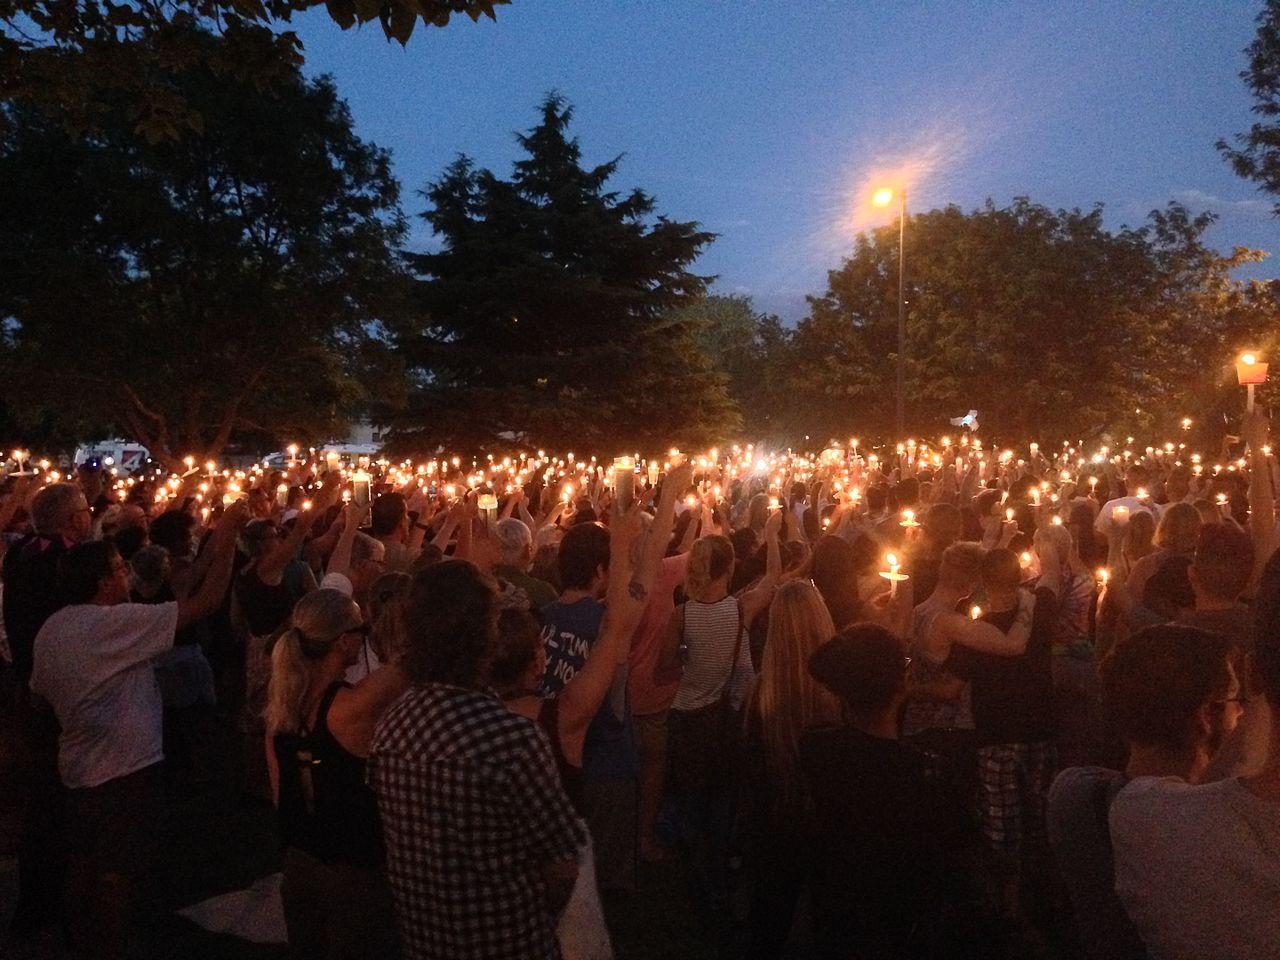 Candlelight vigil for the Orlando nightclub shooting held in Albuquerque, New Mexico (PHOTO by Kaldari)